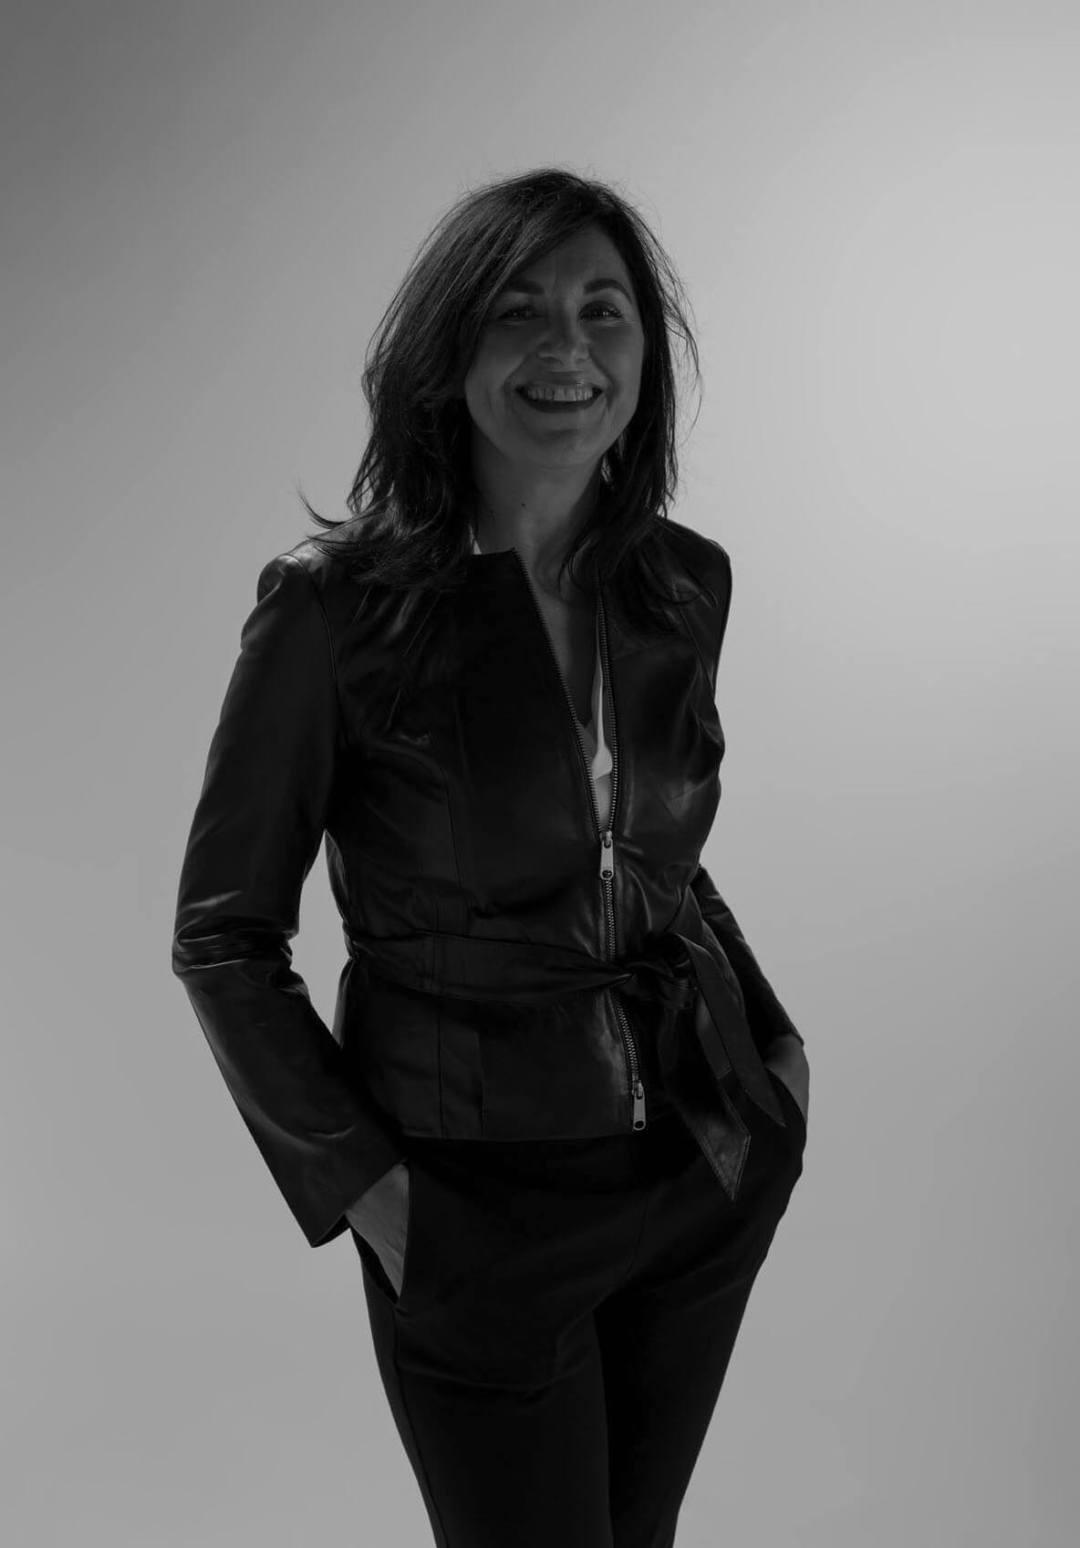 Christa Hudelist